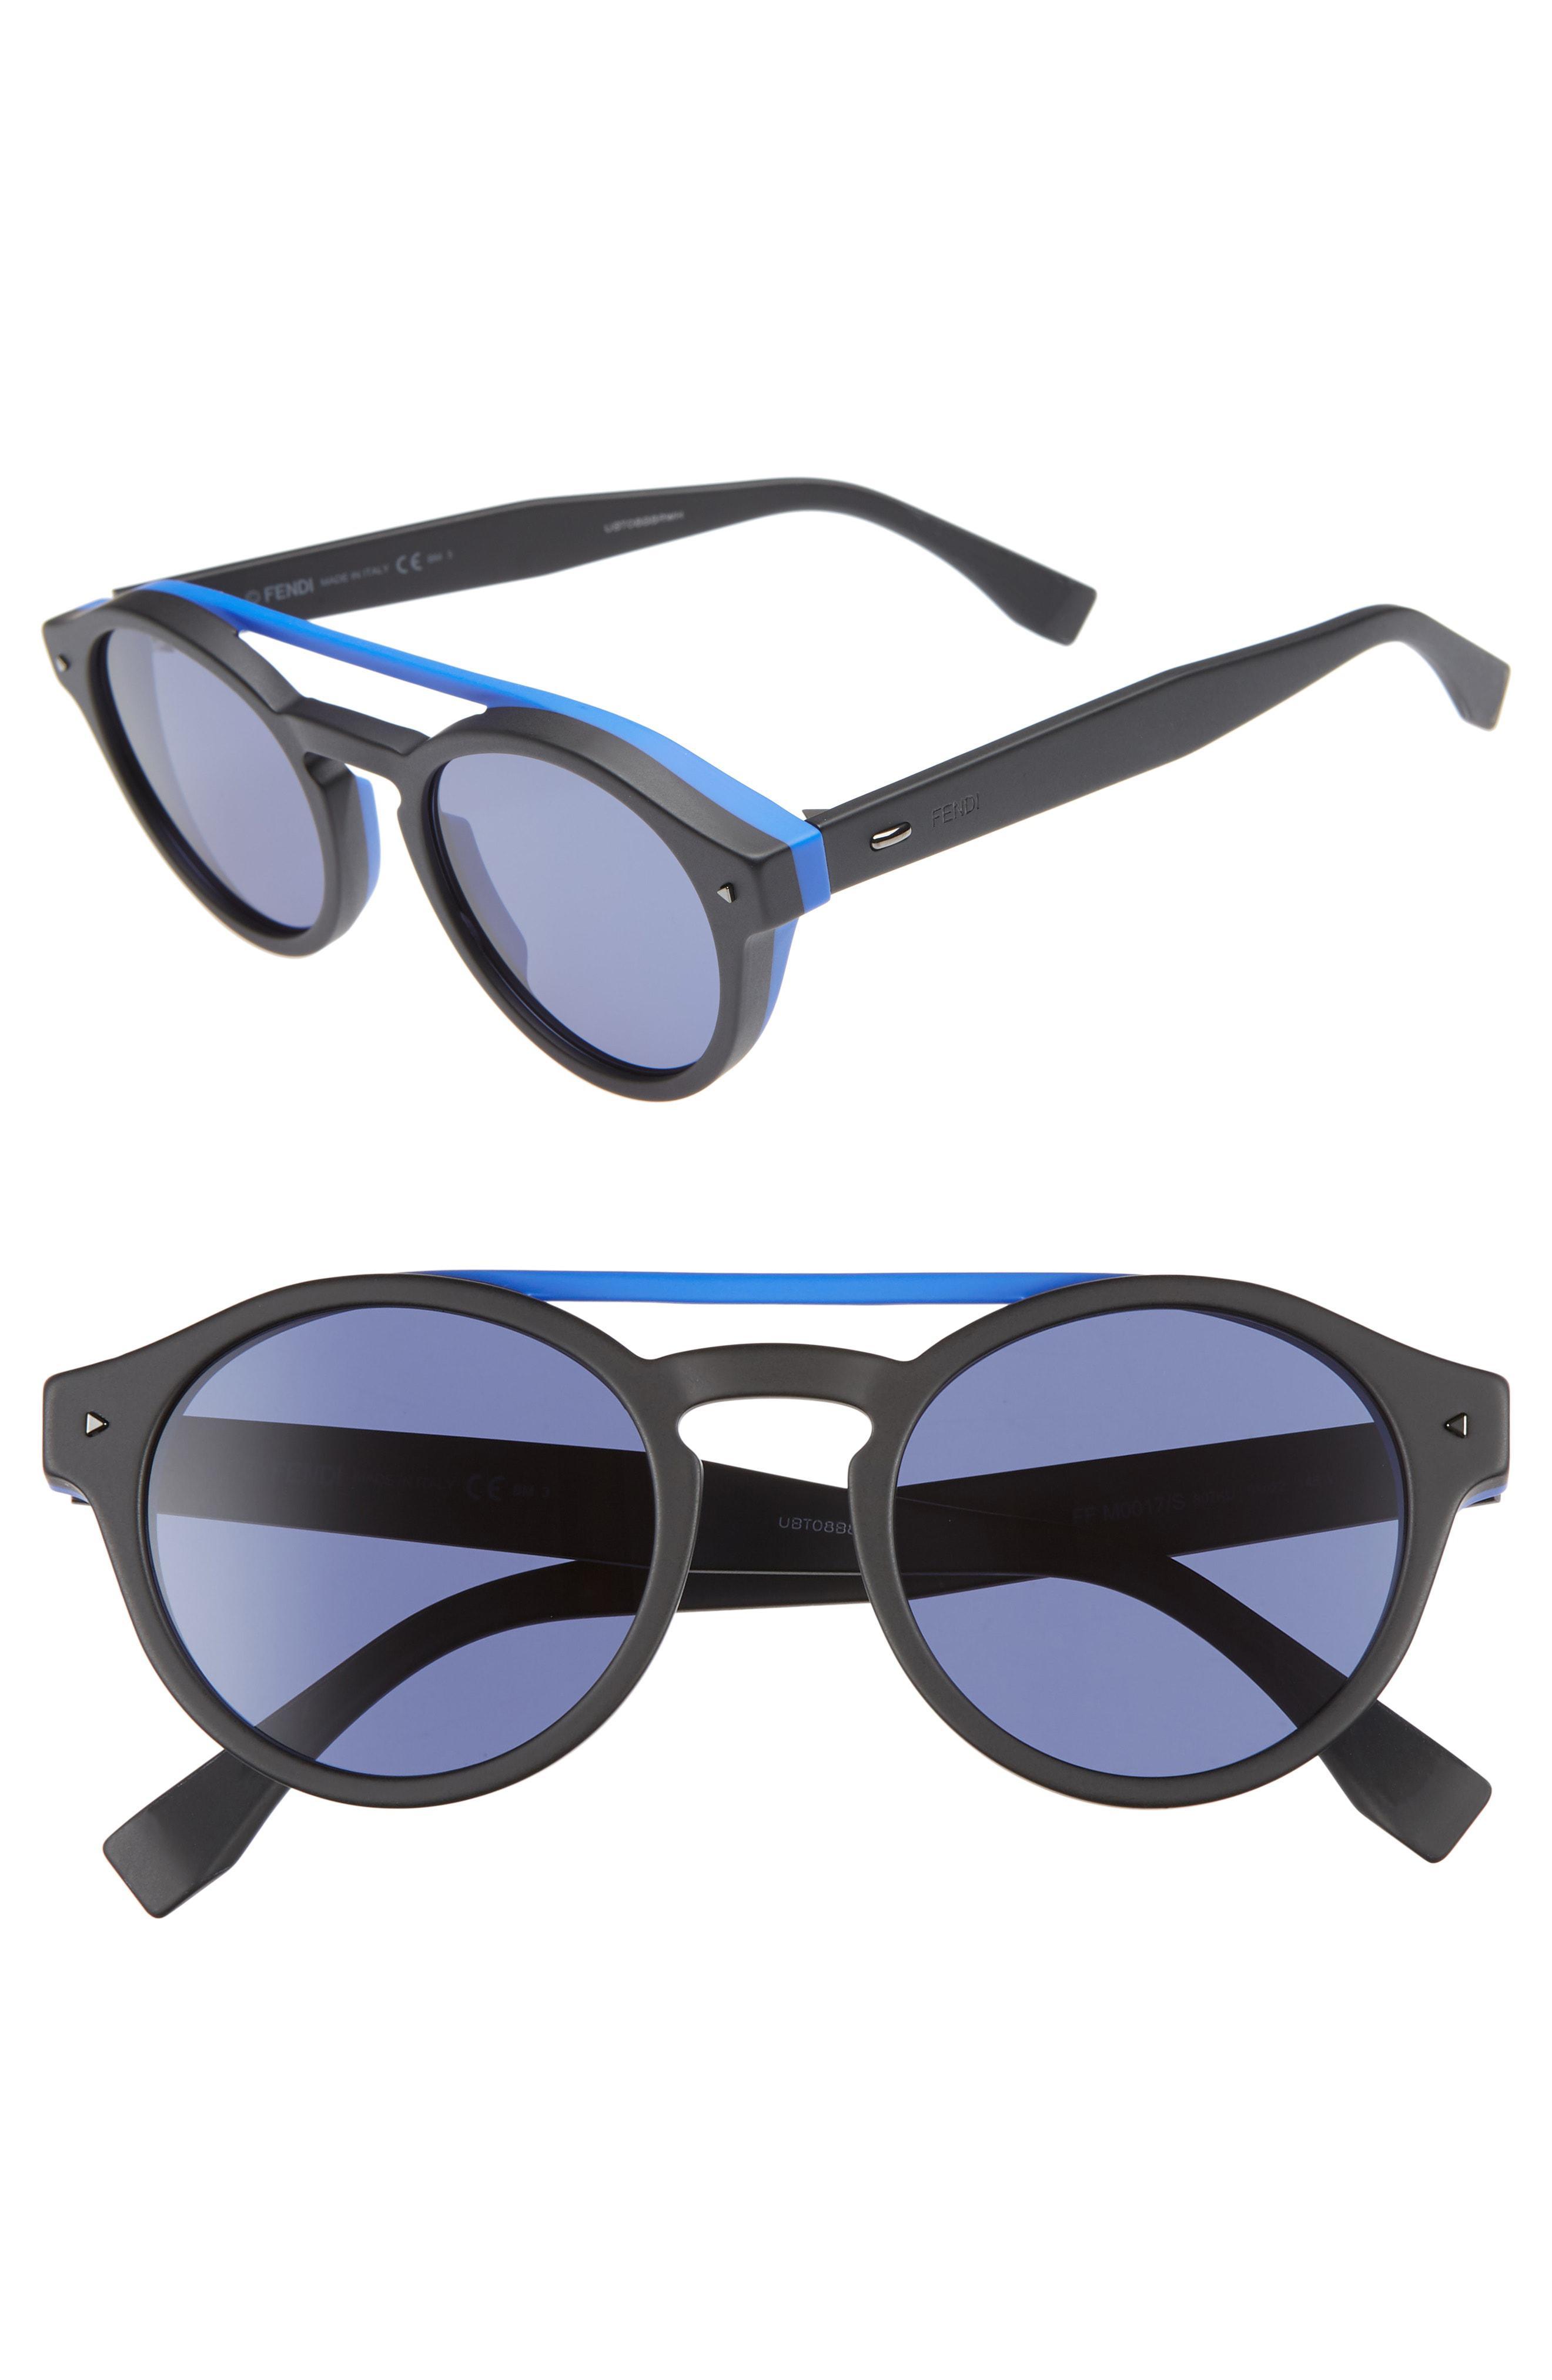 34a8dea679 Lyst - Fendi 51mm Round Sunglasses in Black for Men